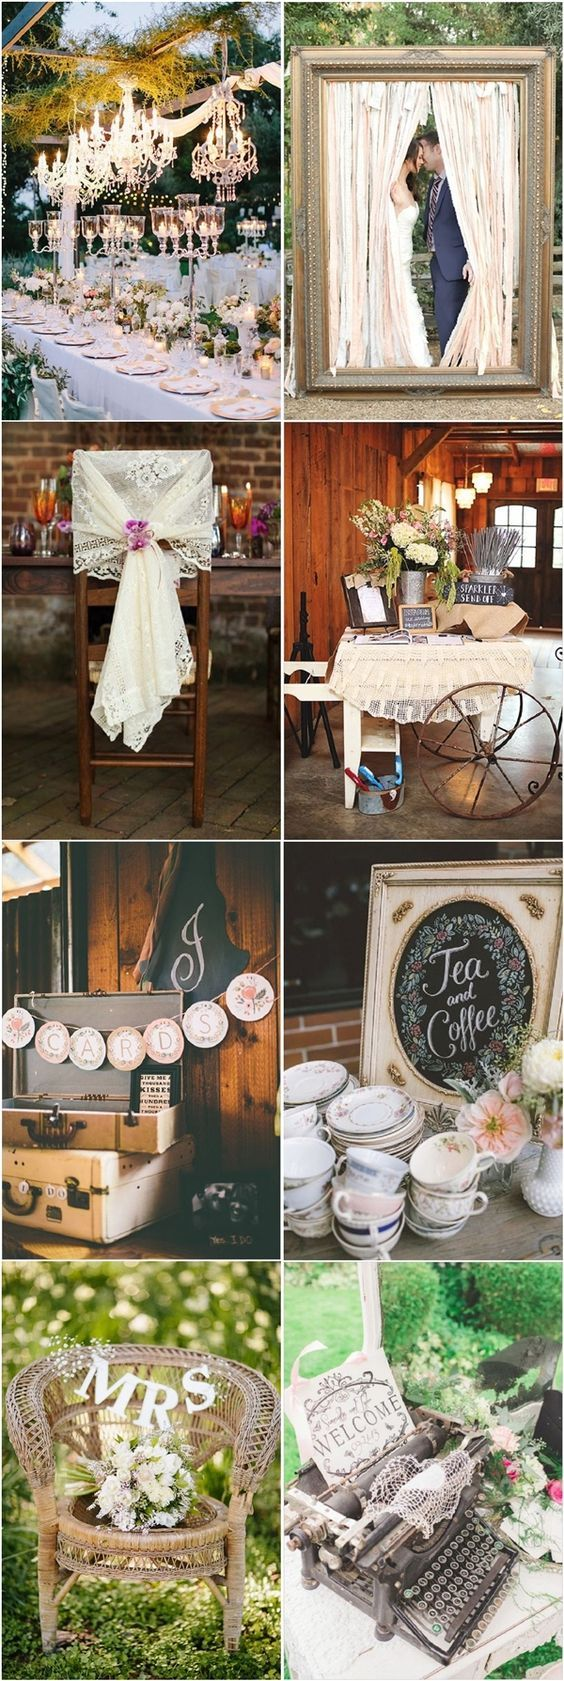 Fall wedding decoration ideas reception   Amazing Outdoor Fall Wedding Décor Ideas  Pinterest  Antique